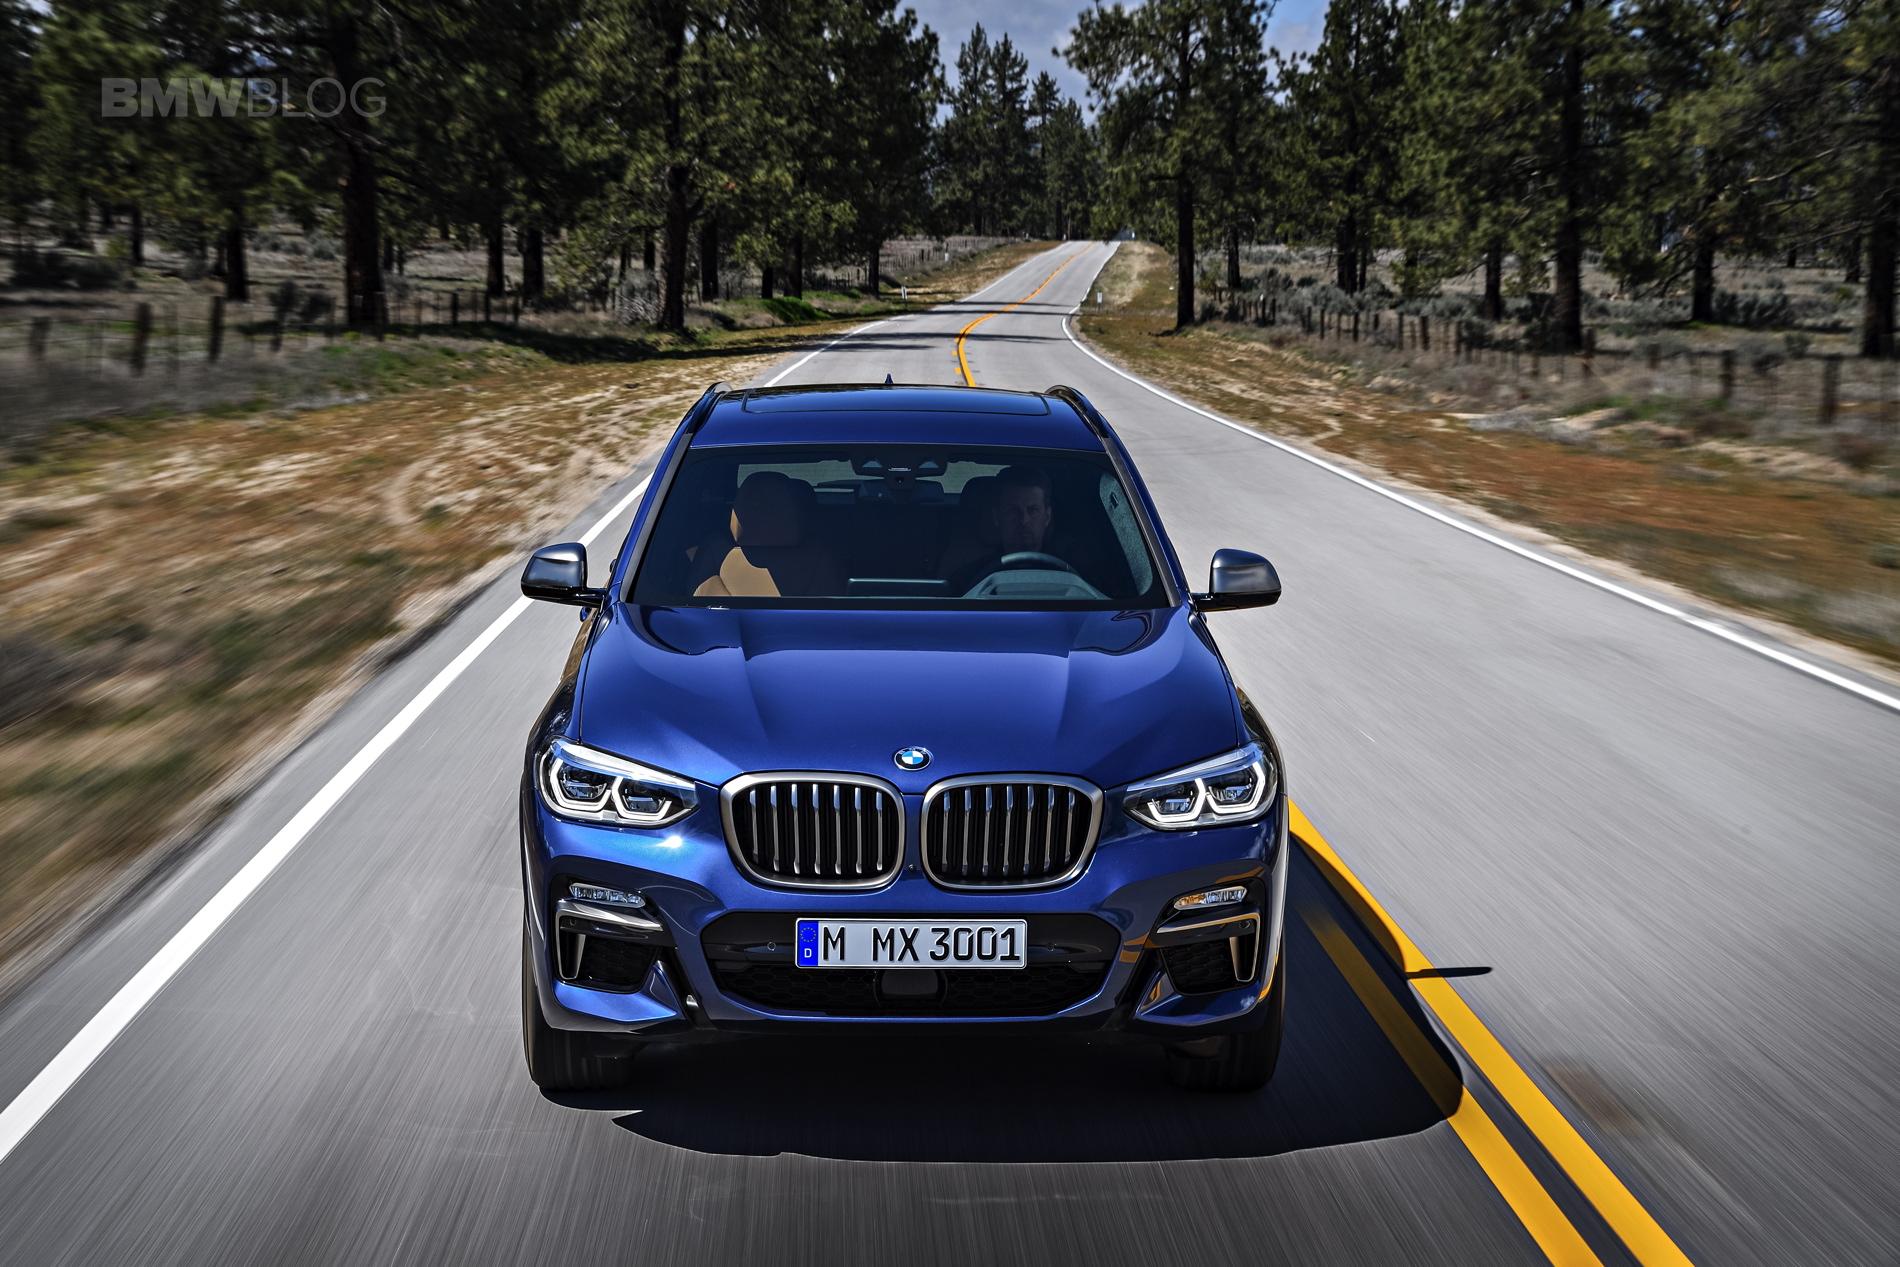 2018 BMW X3 G01 official photos 45